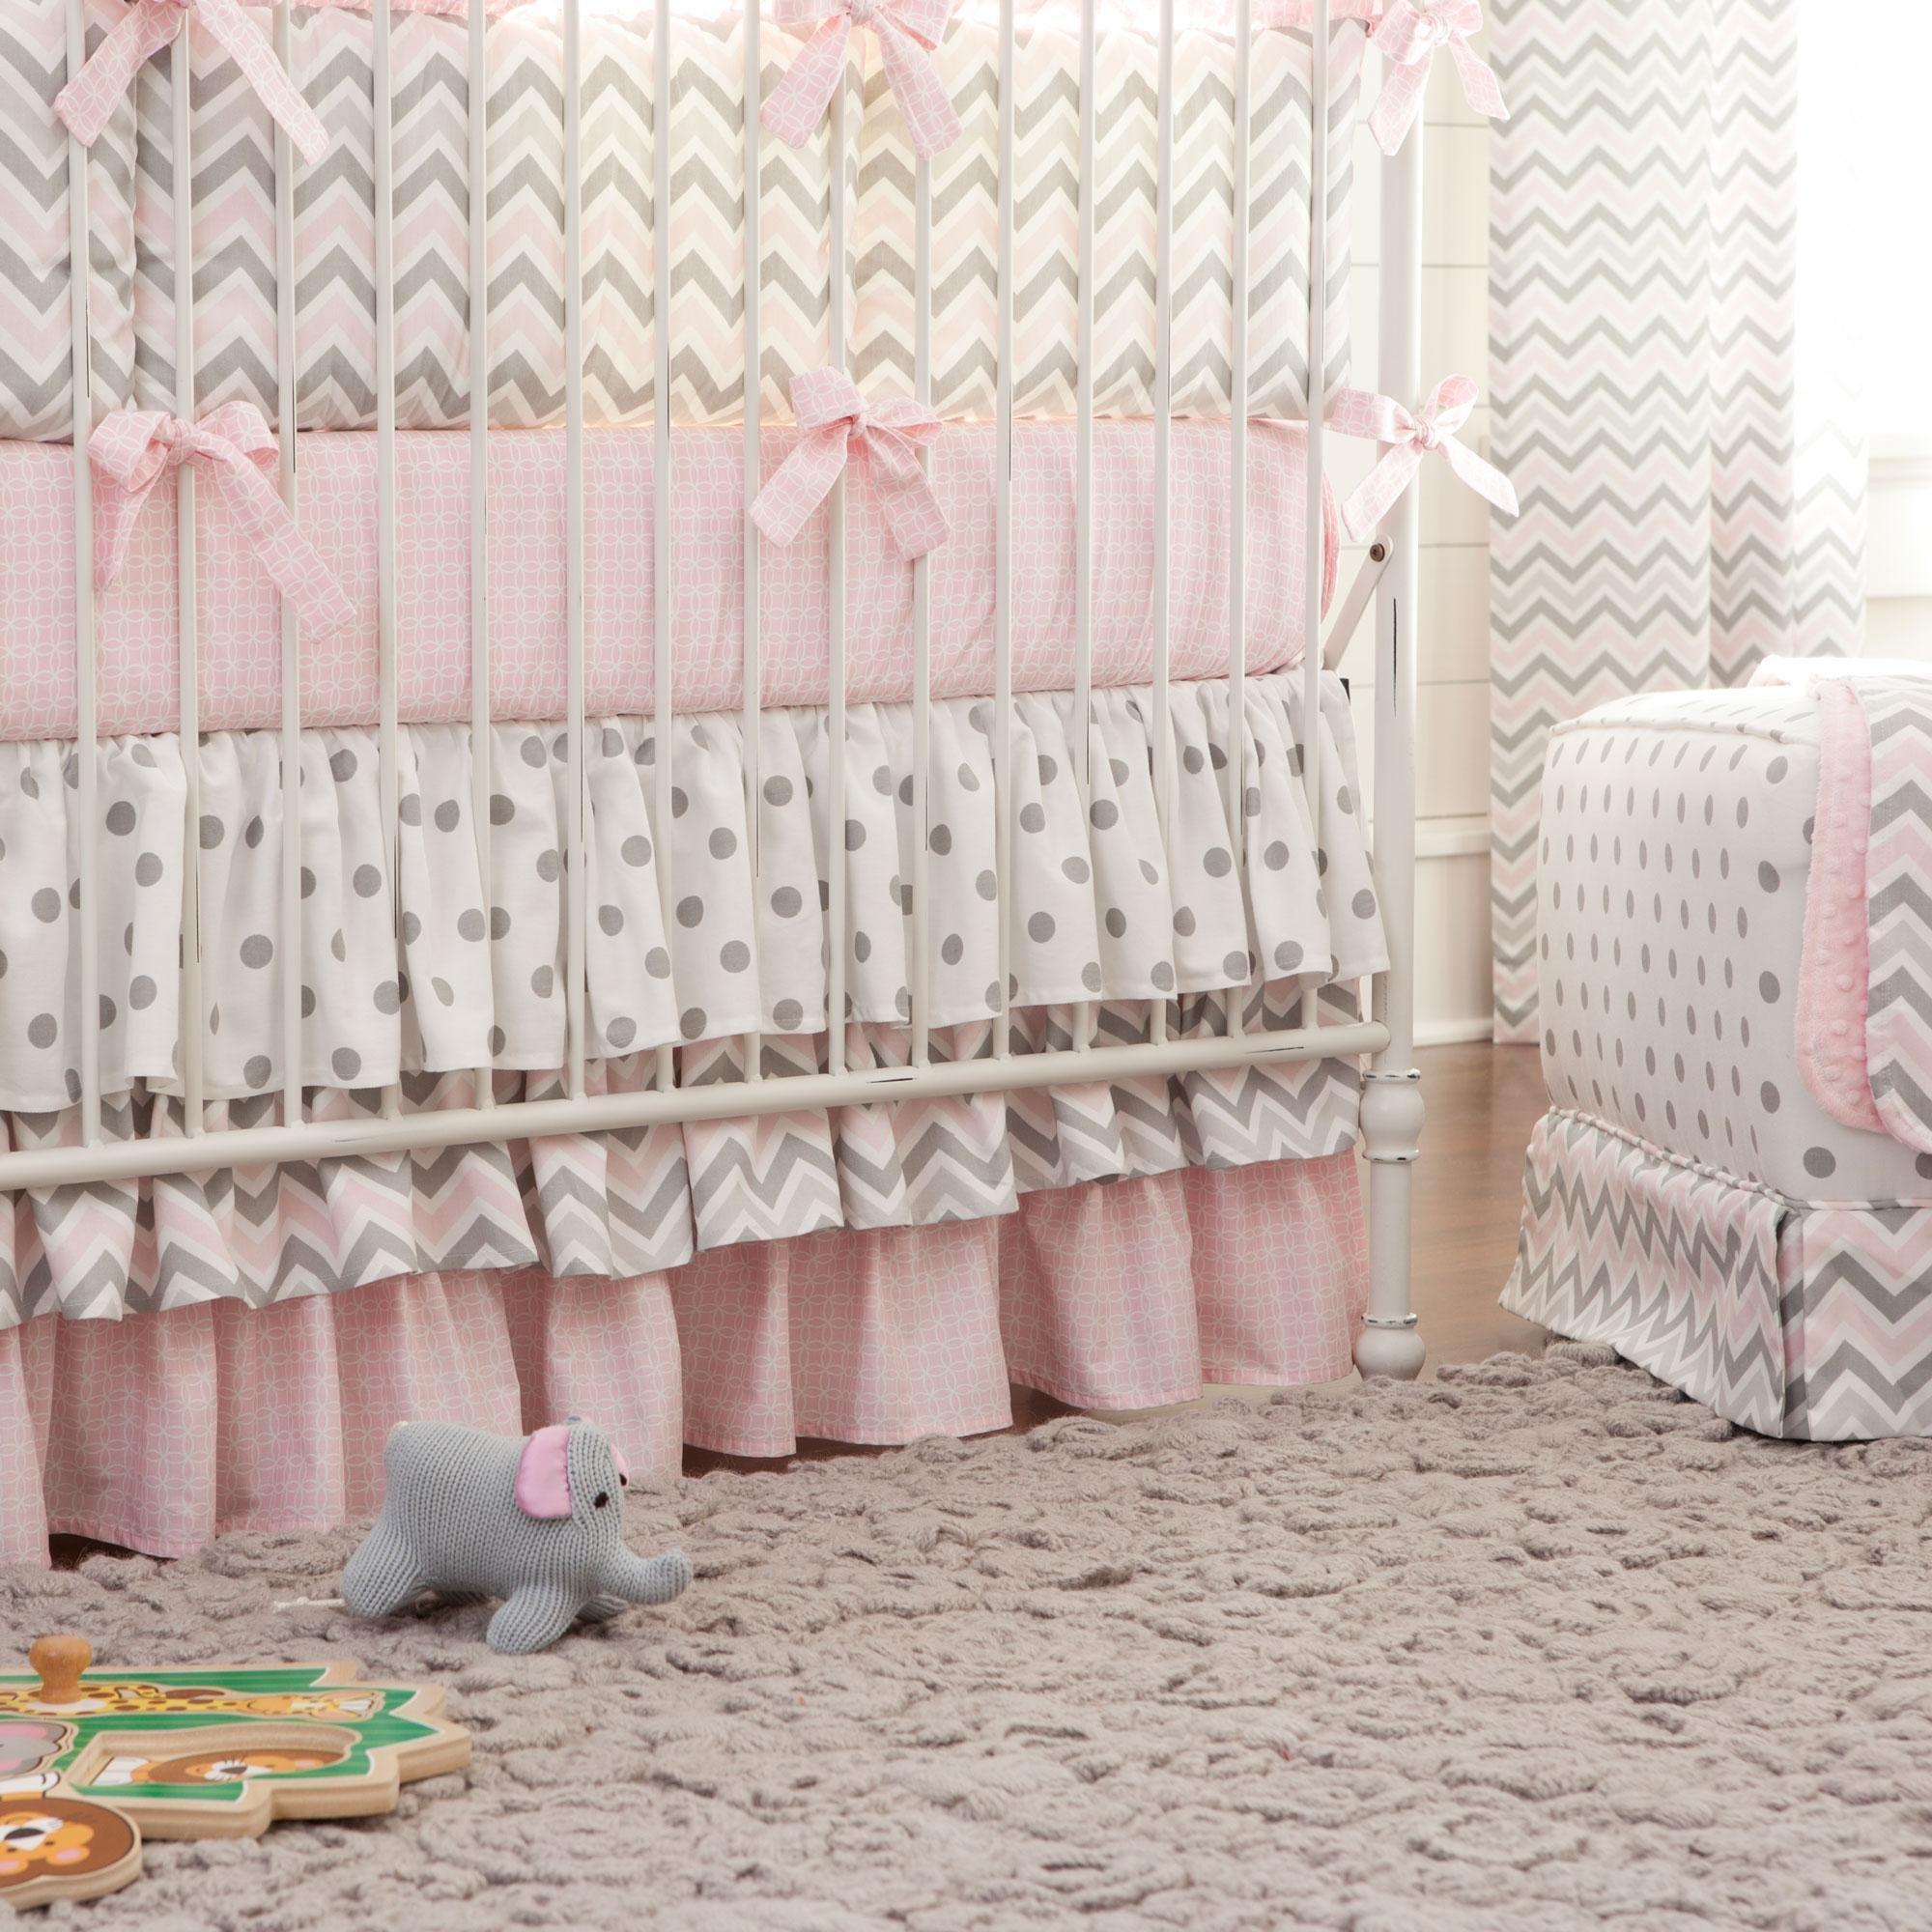 Carousel Designs Pink and Gray Chevron Crib Skirt Three Tier 18-Inch Length